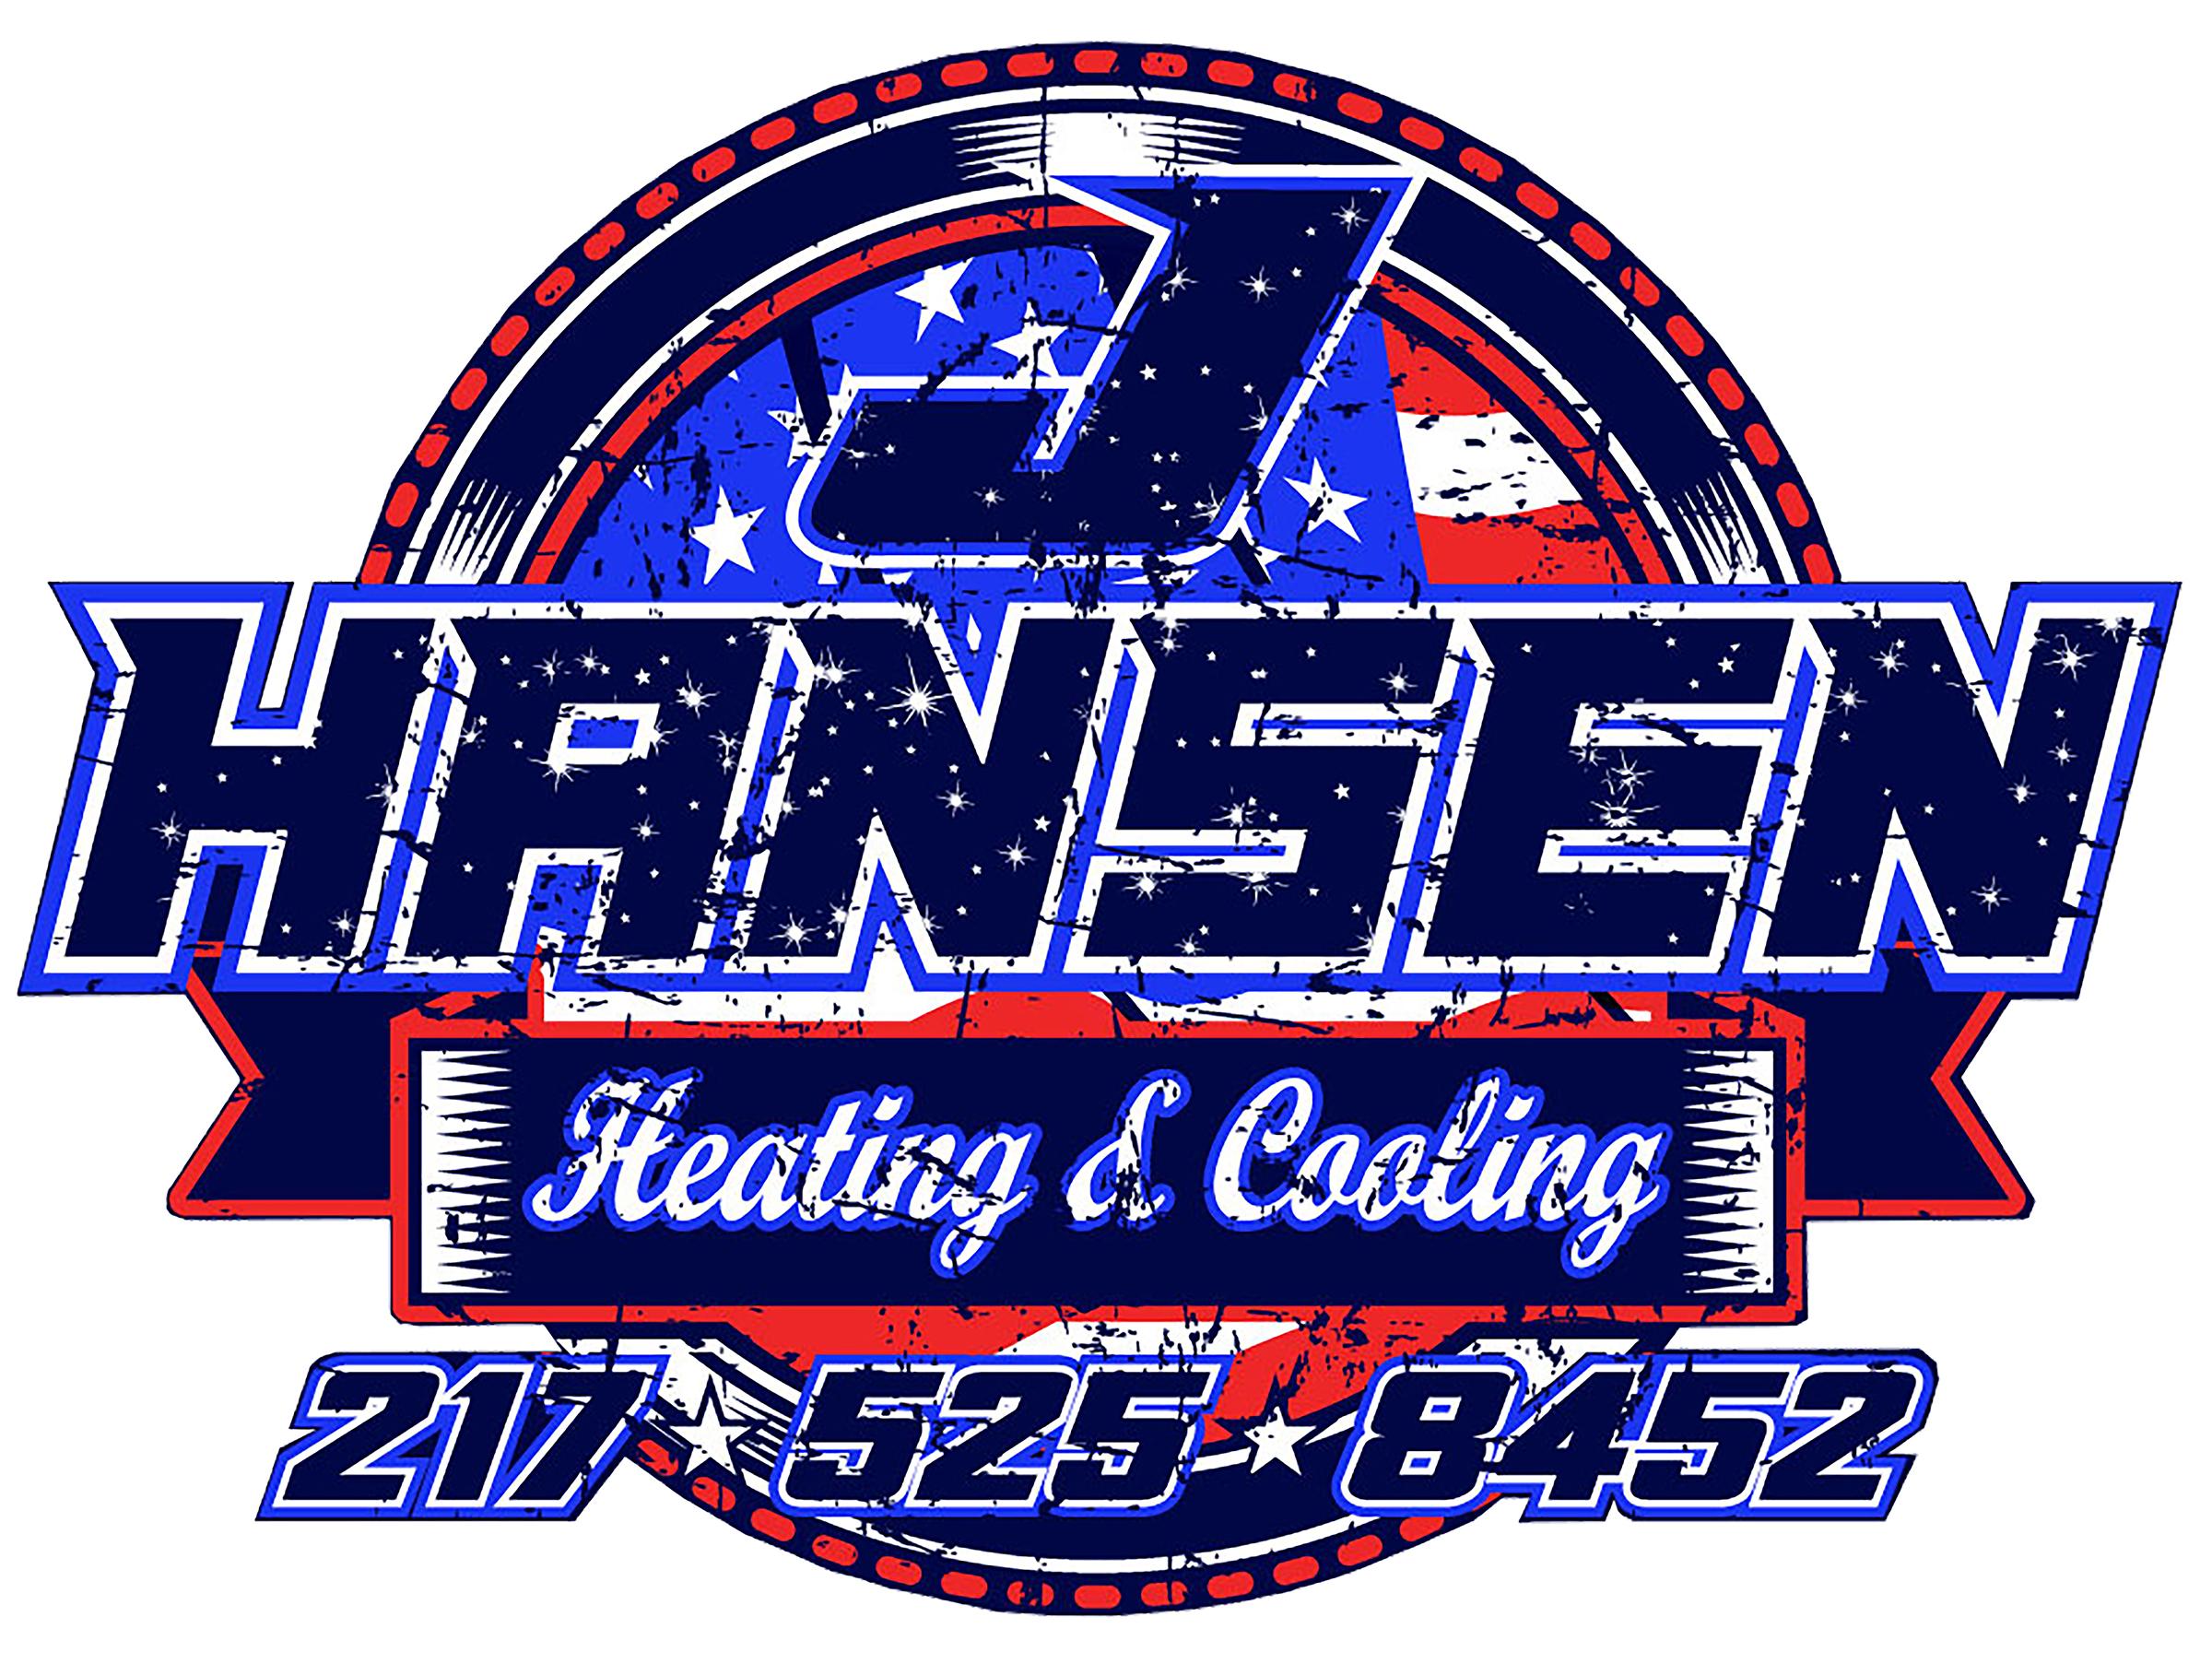 J Hansen Heating & Cooling